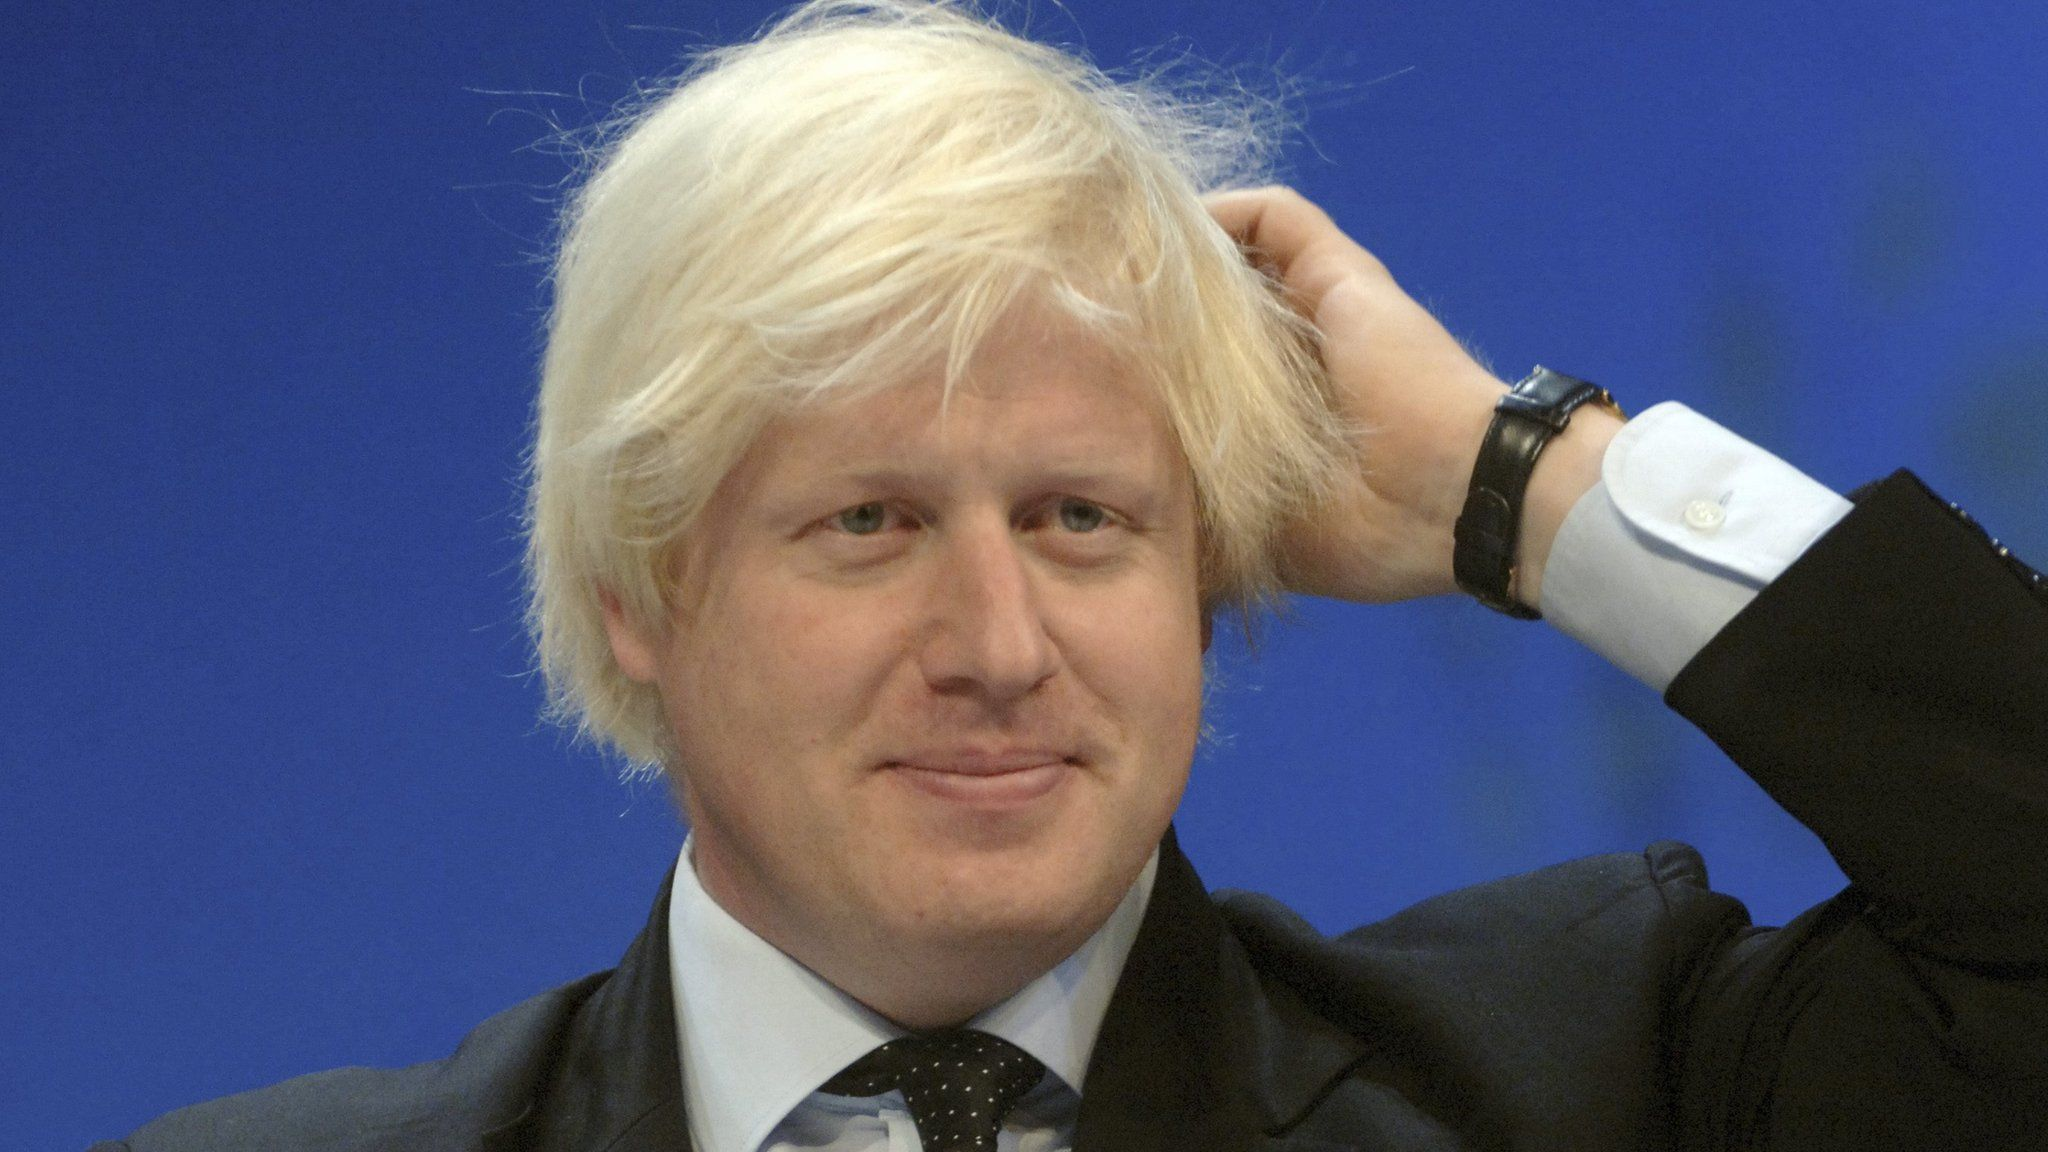 Boris Johnson in 2006